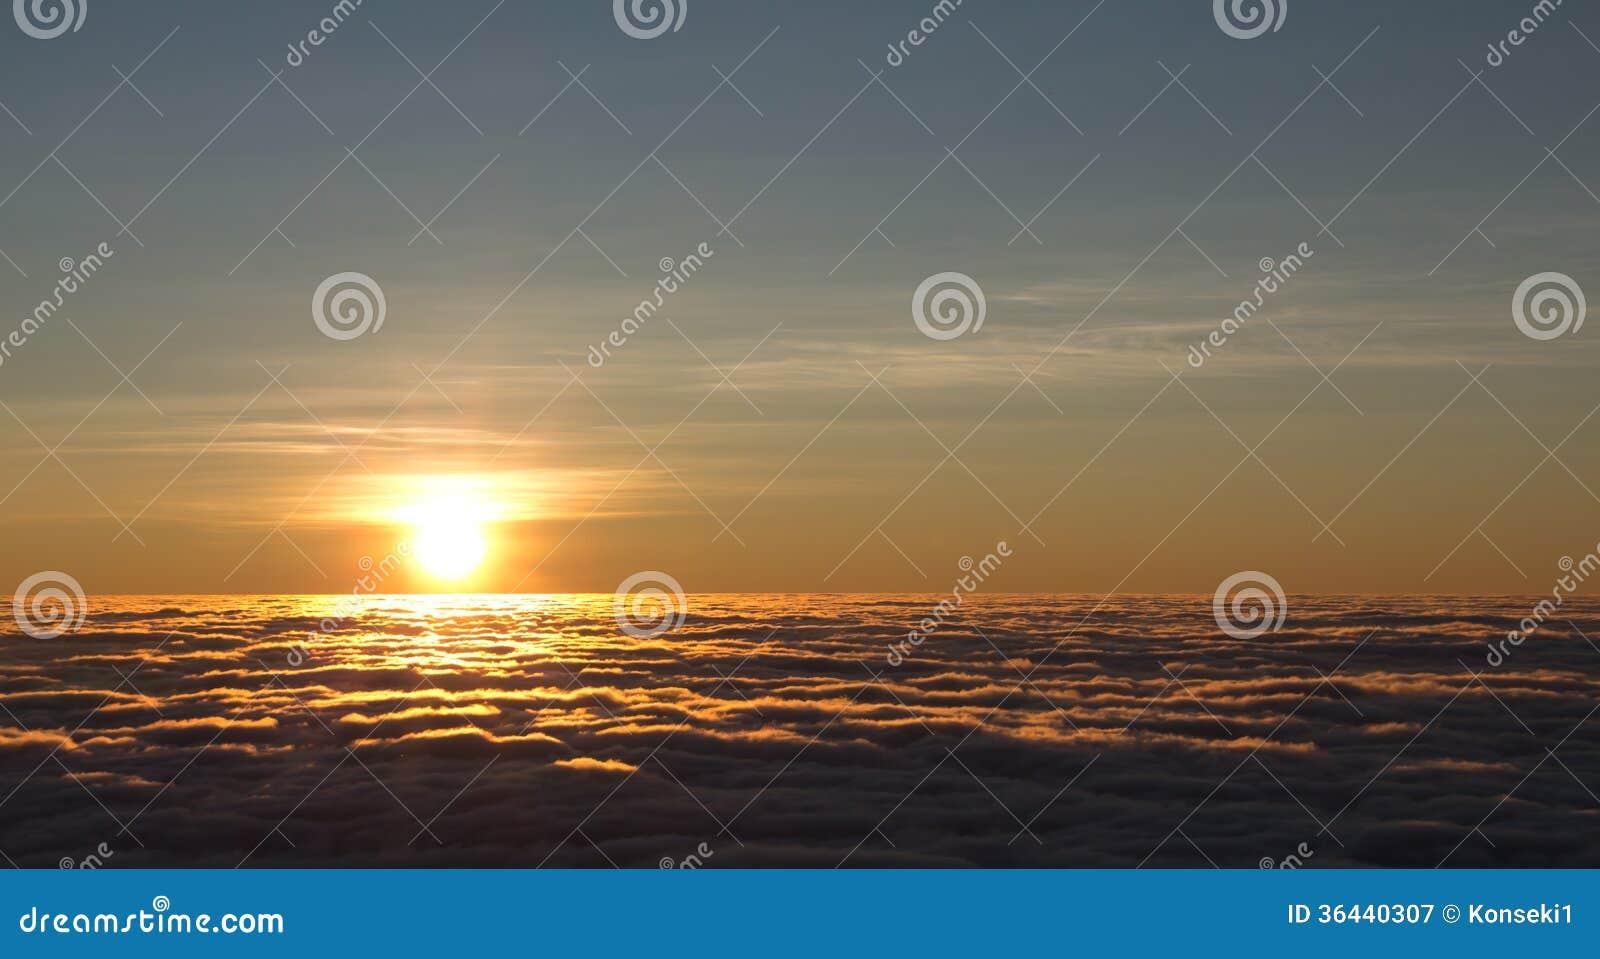 Summer: 2 (Sunrise)